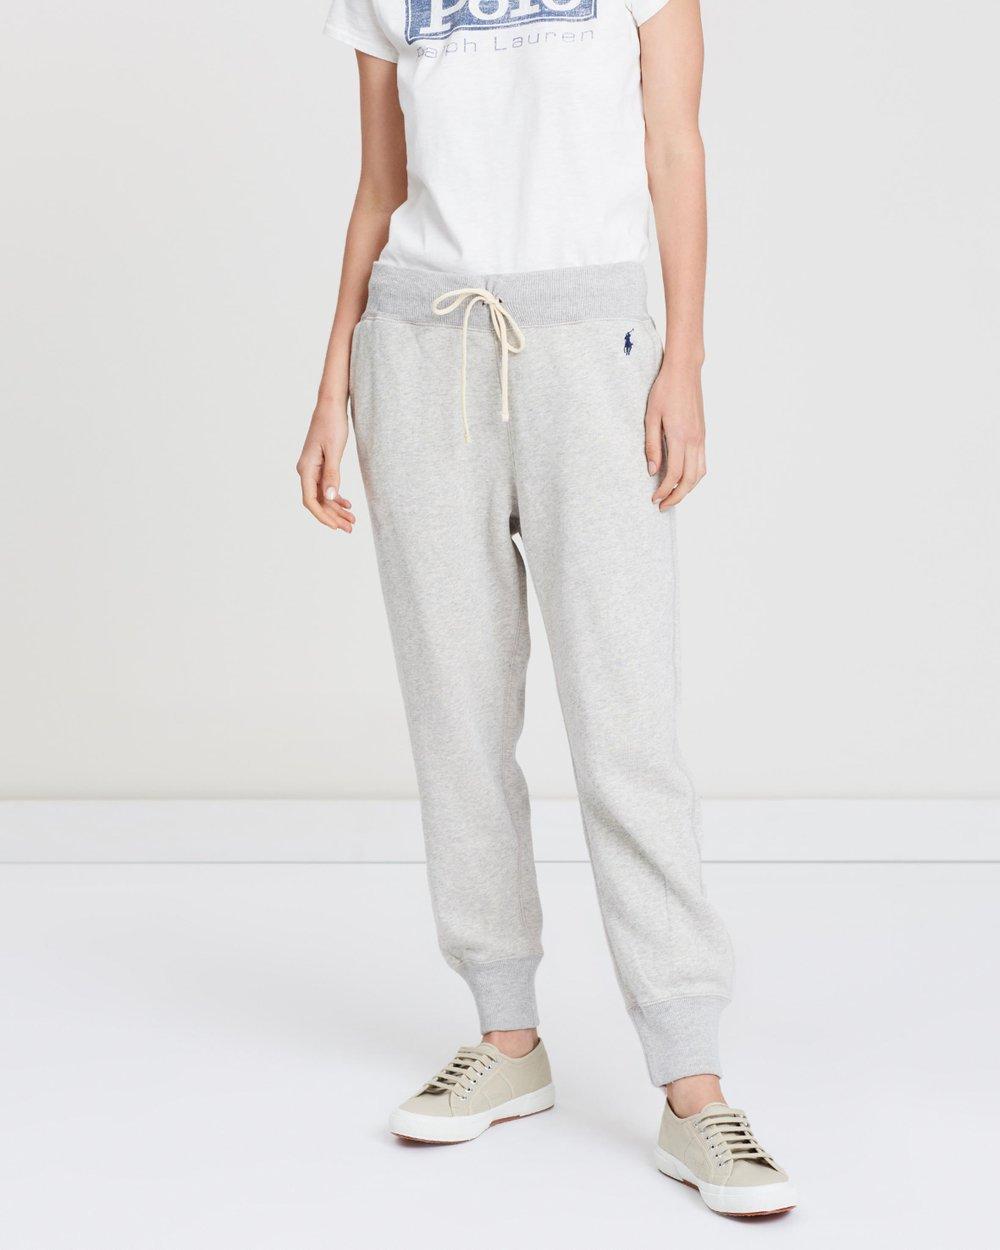 258bc3bb1 Sweatpants by Polo Ralph Lauren Online